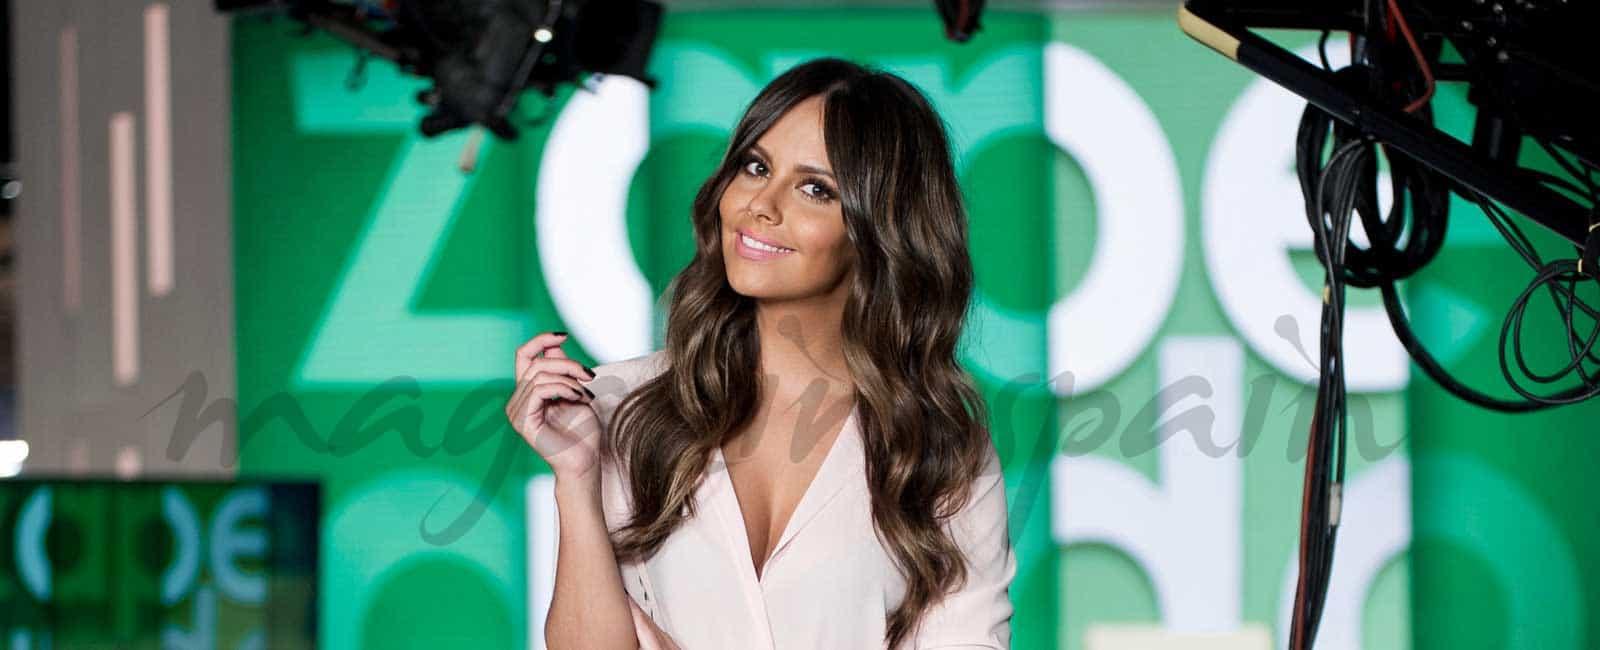 Cristina Pedroche también se «atreve» a cantar